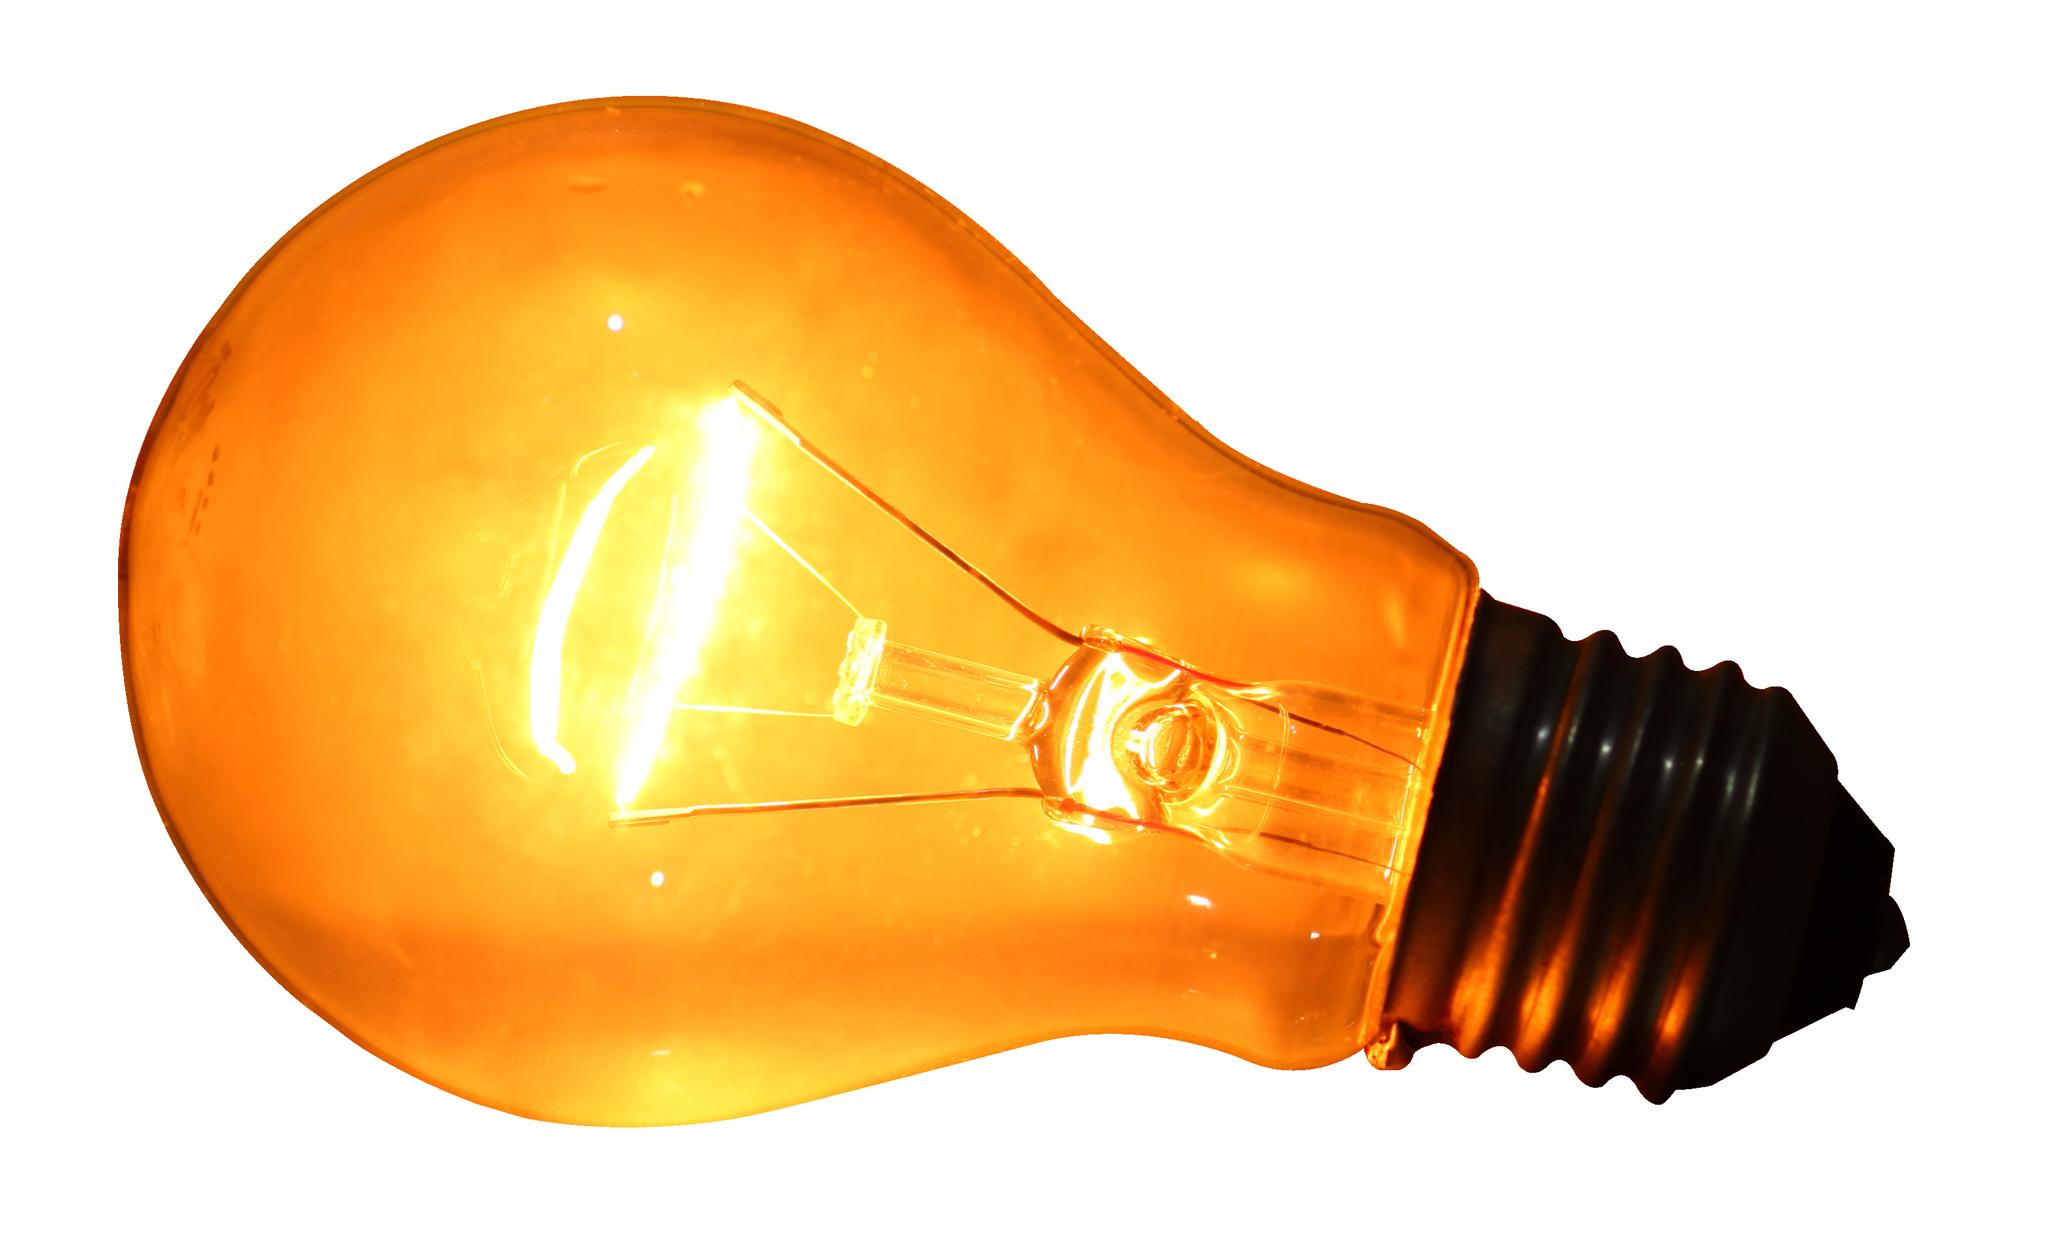 Light Bulb PNG Transparent Image - Bulb HD PNG